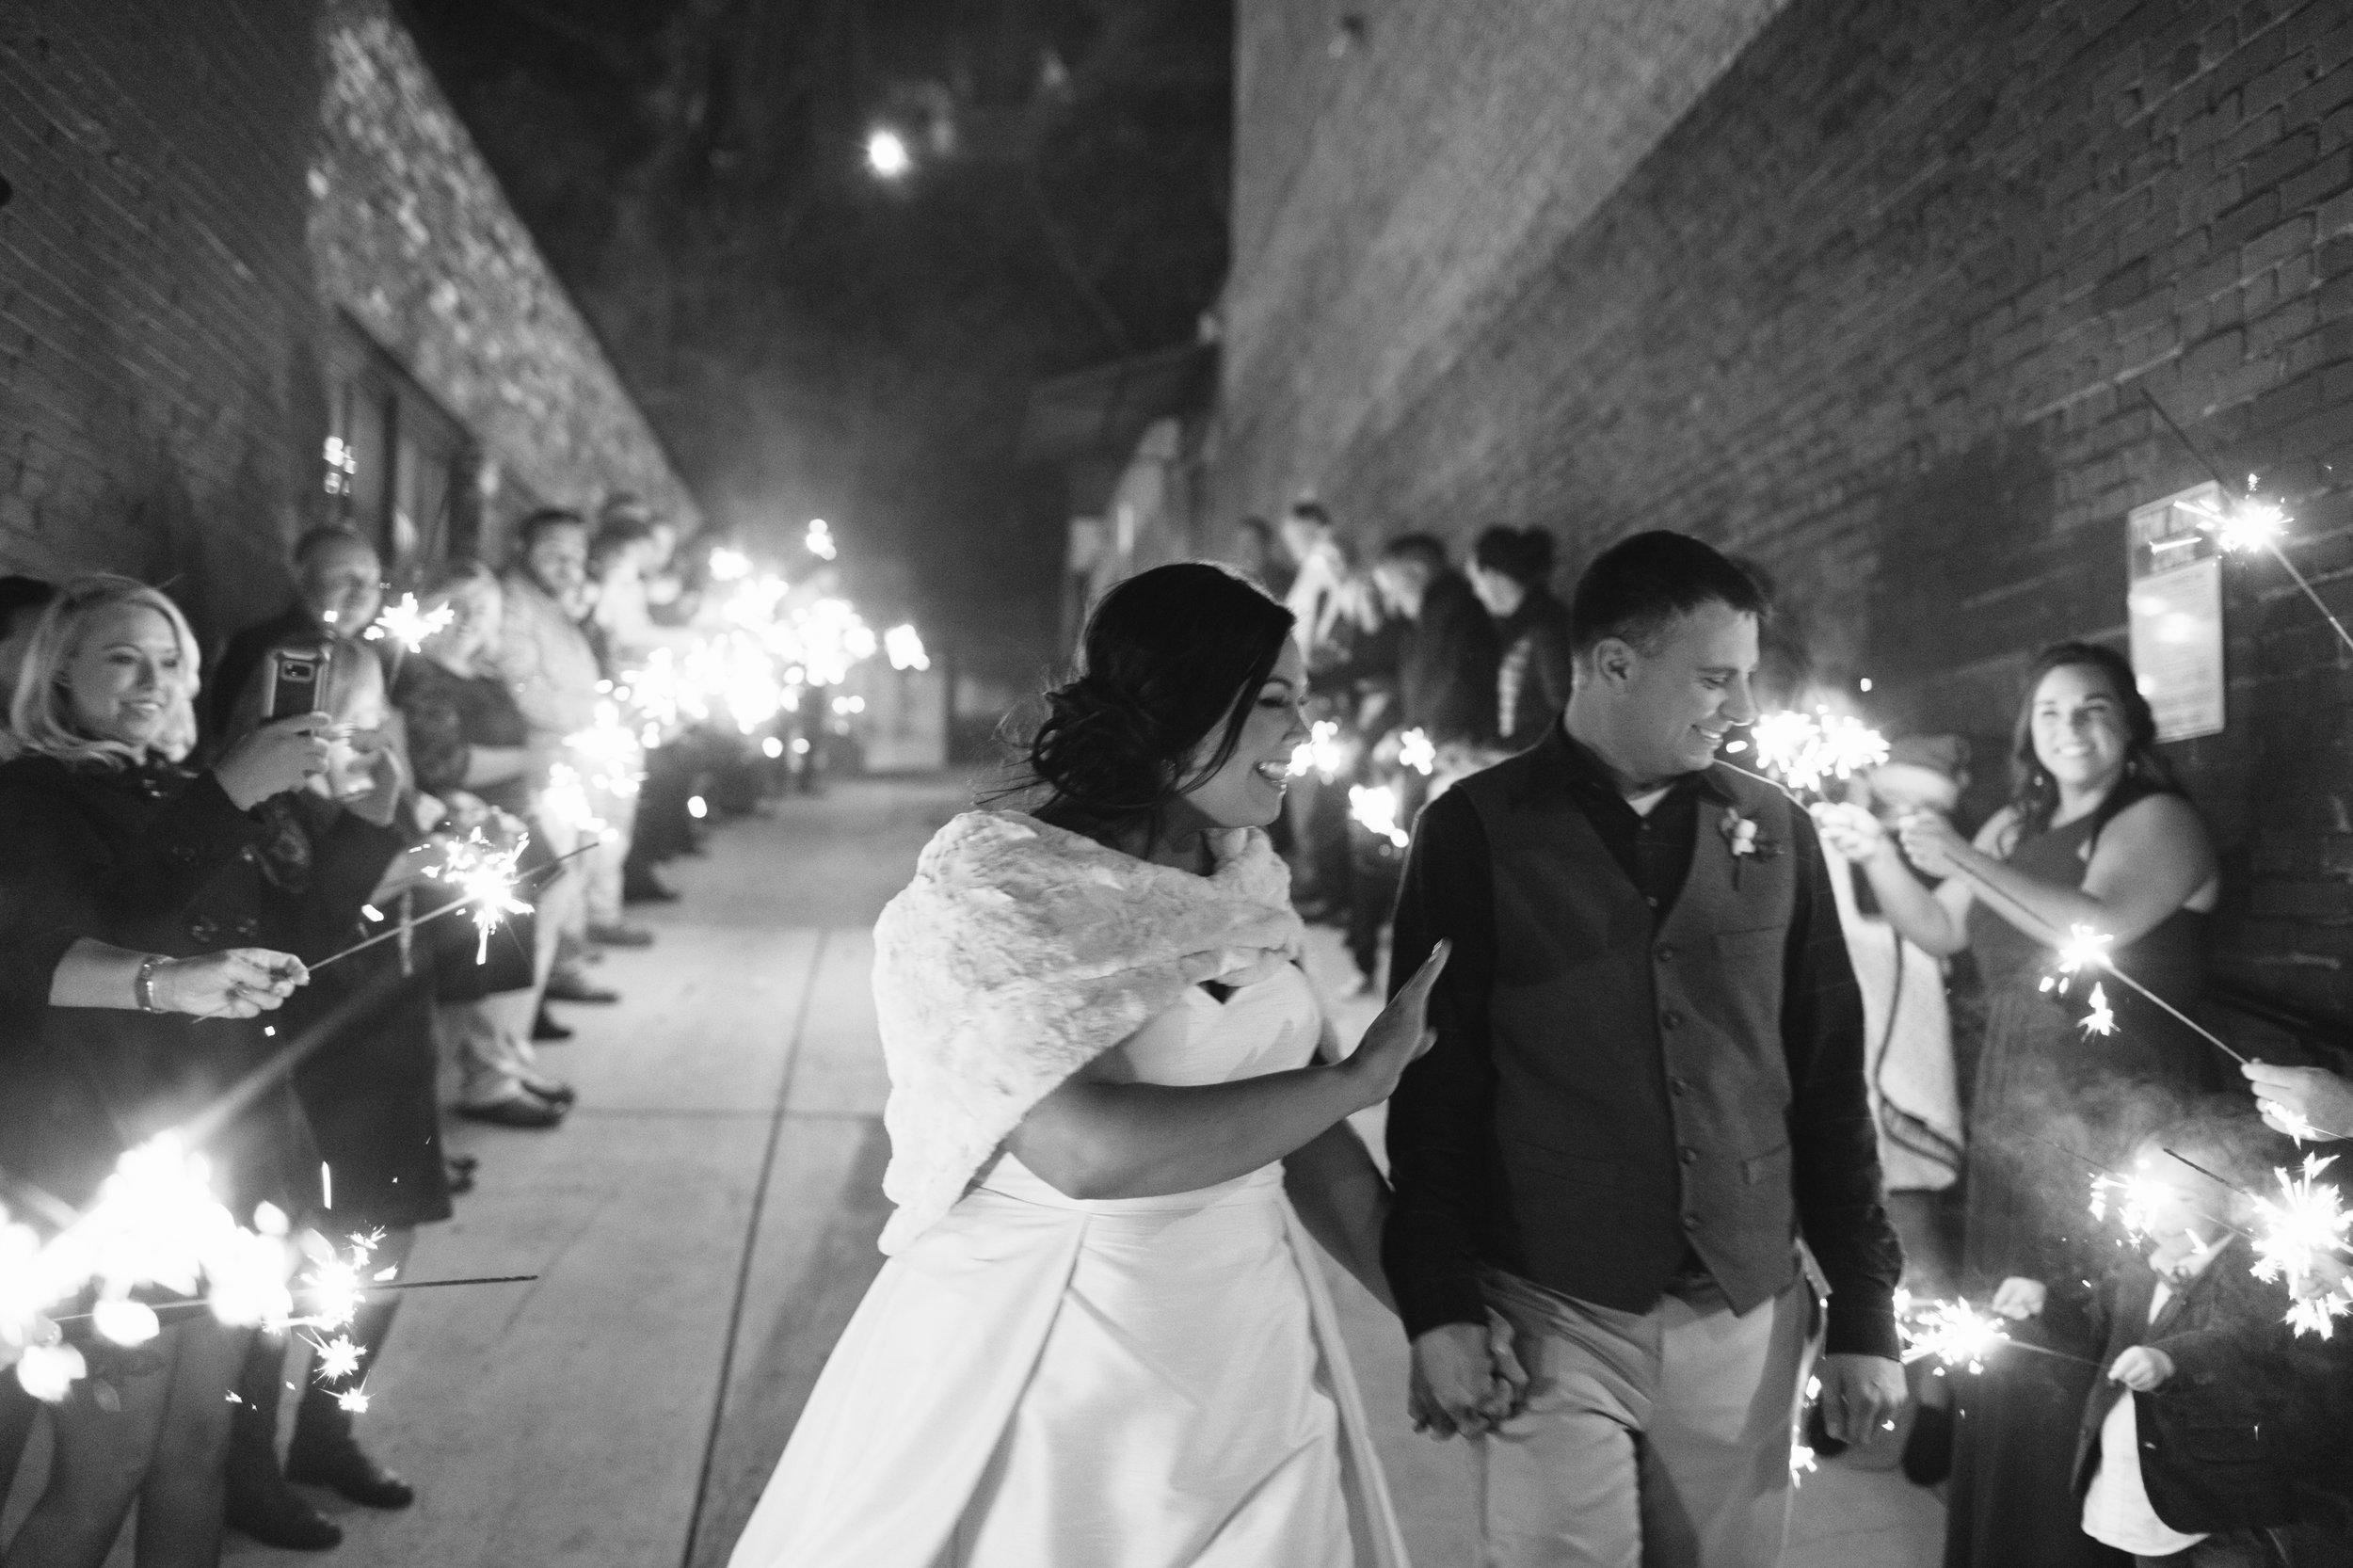 Lauren_Jeremy_Standard_Wedding_Knoxville_Abigail_Malone_Photography_FIlm-617.jpg